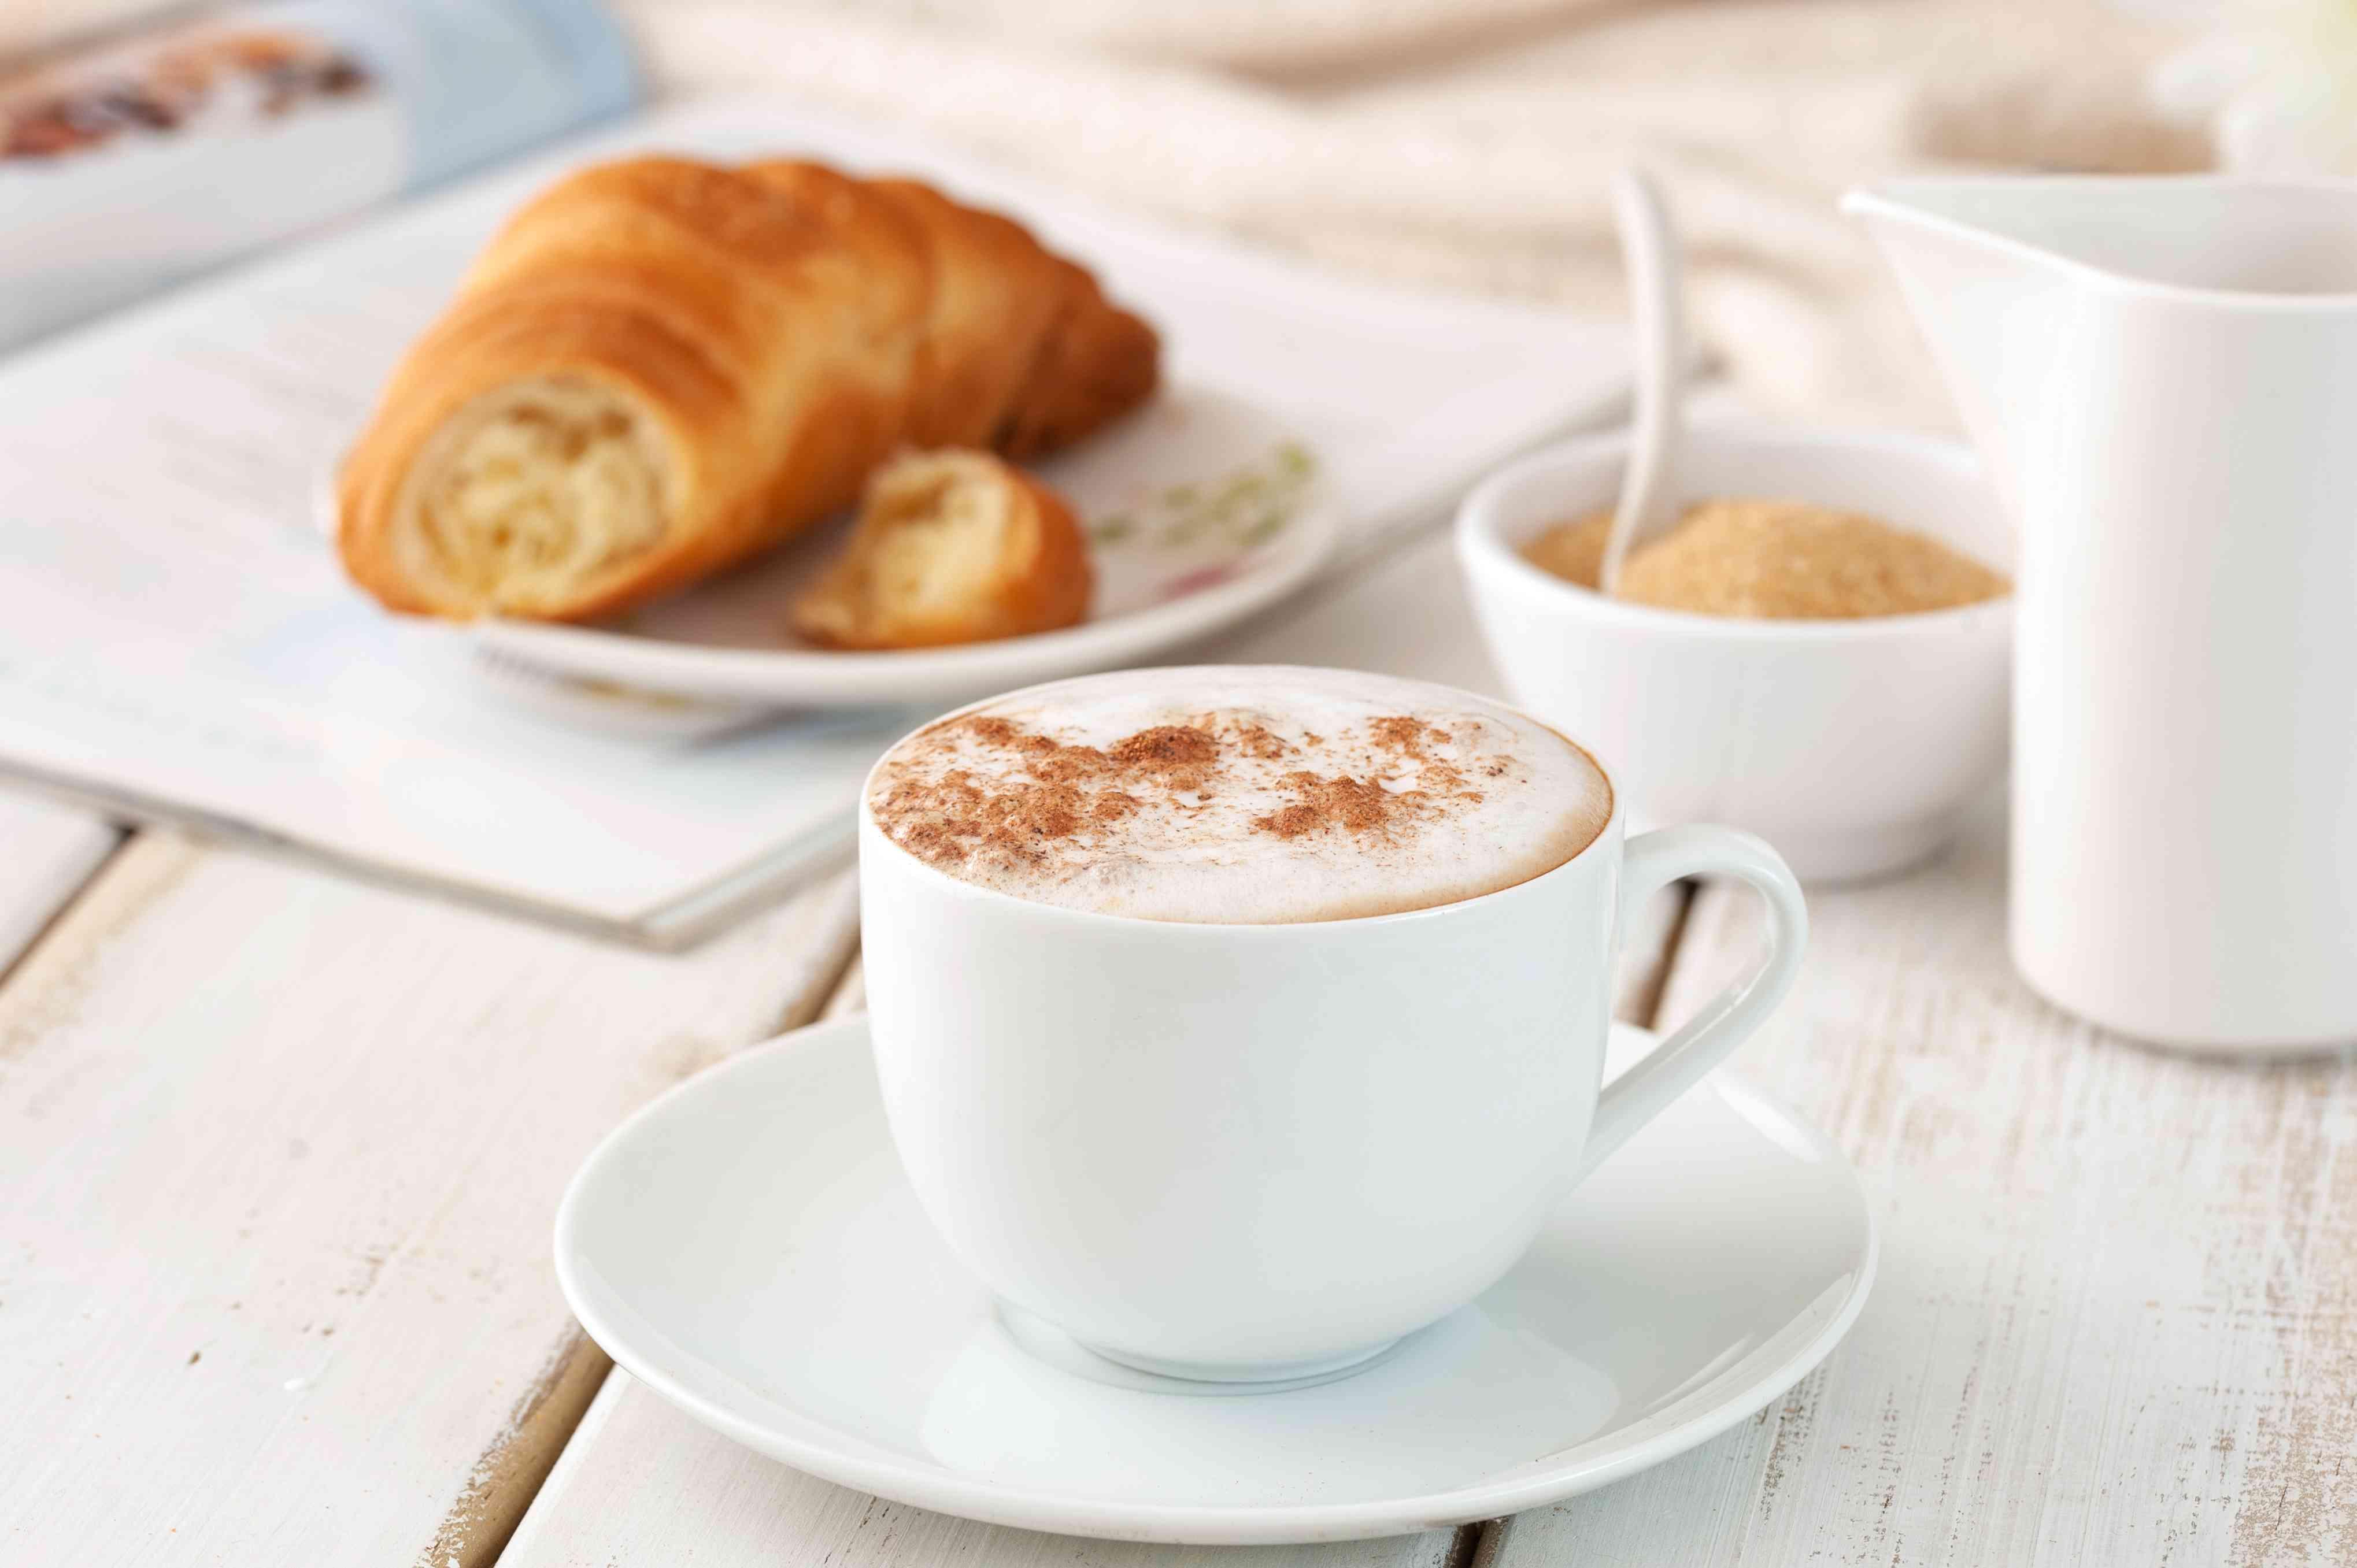 Serving café au lait sprinkled with cinnamon